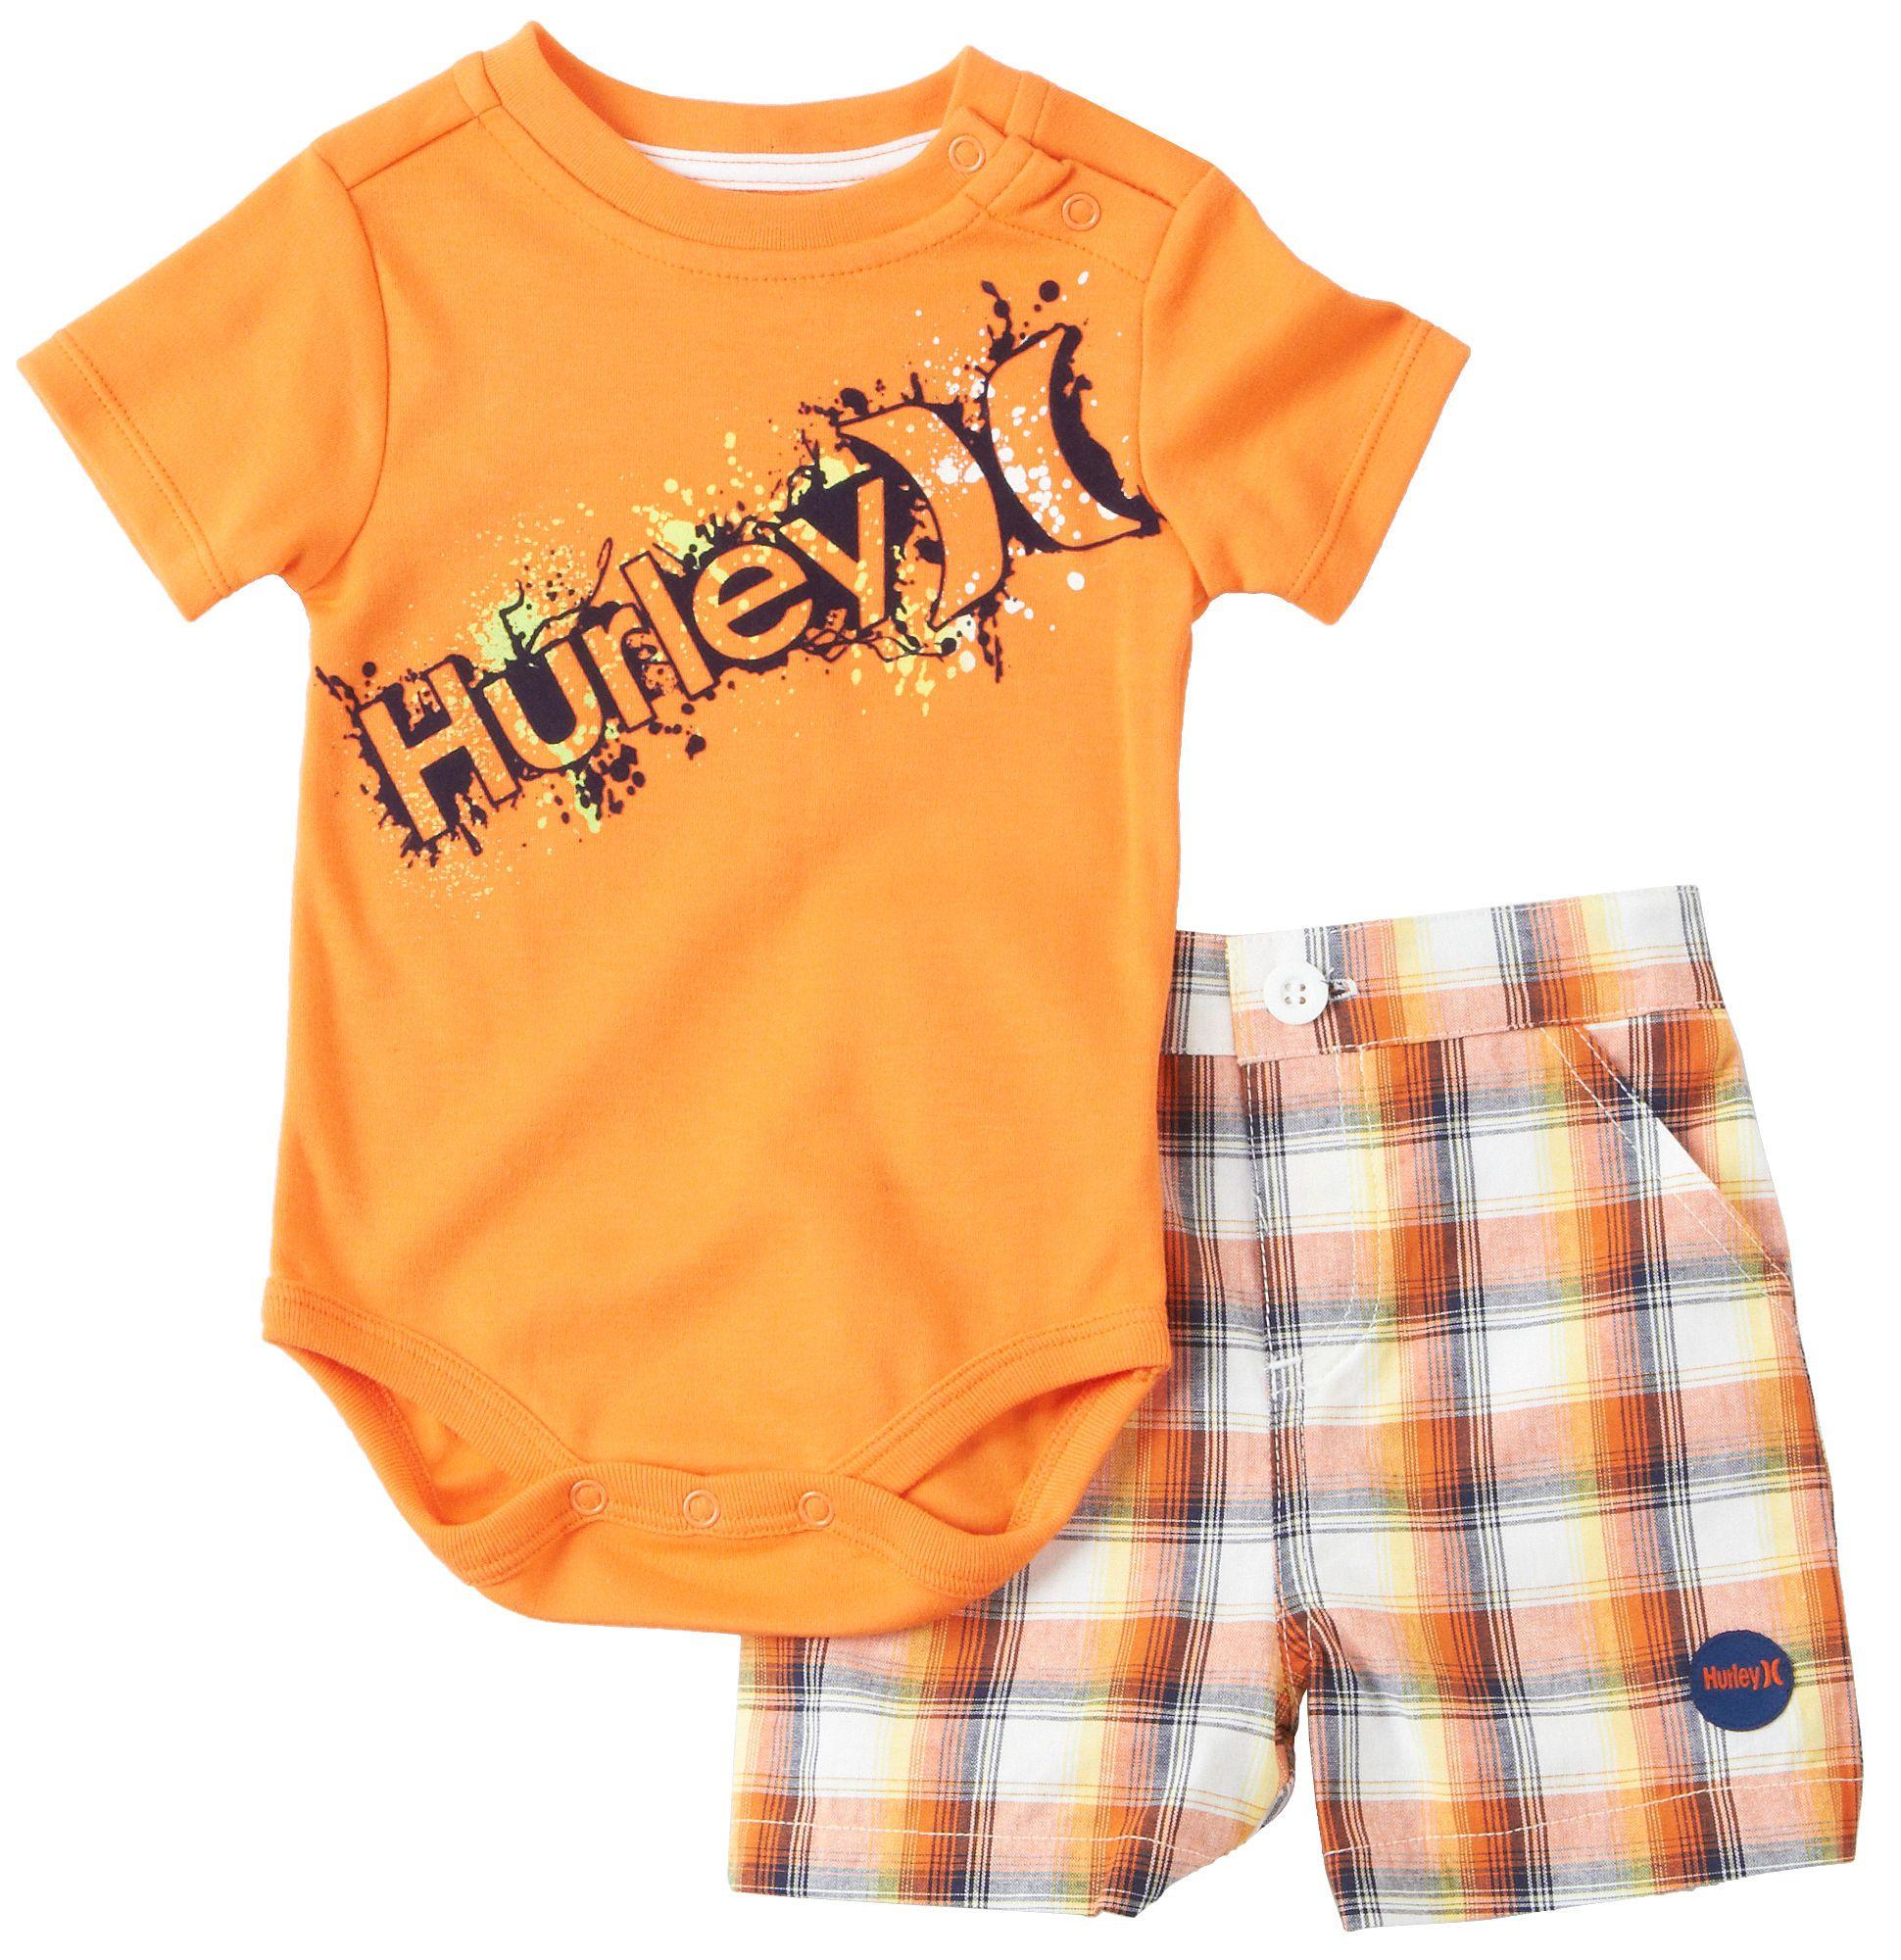 Hurley for Baby beallsflorida surf baby Boogieland